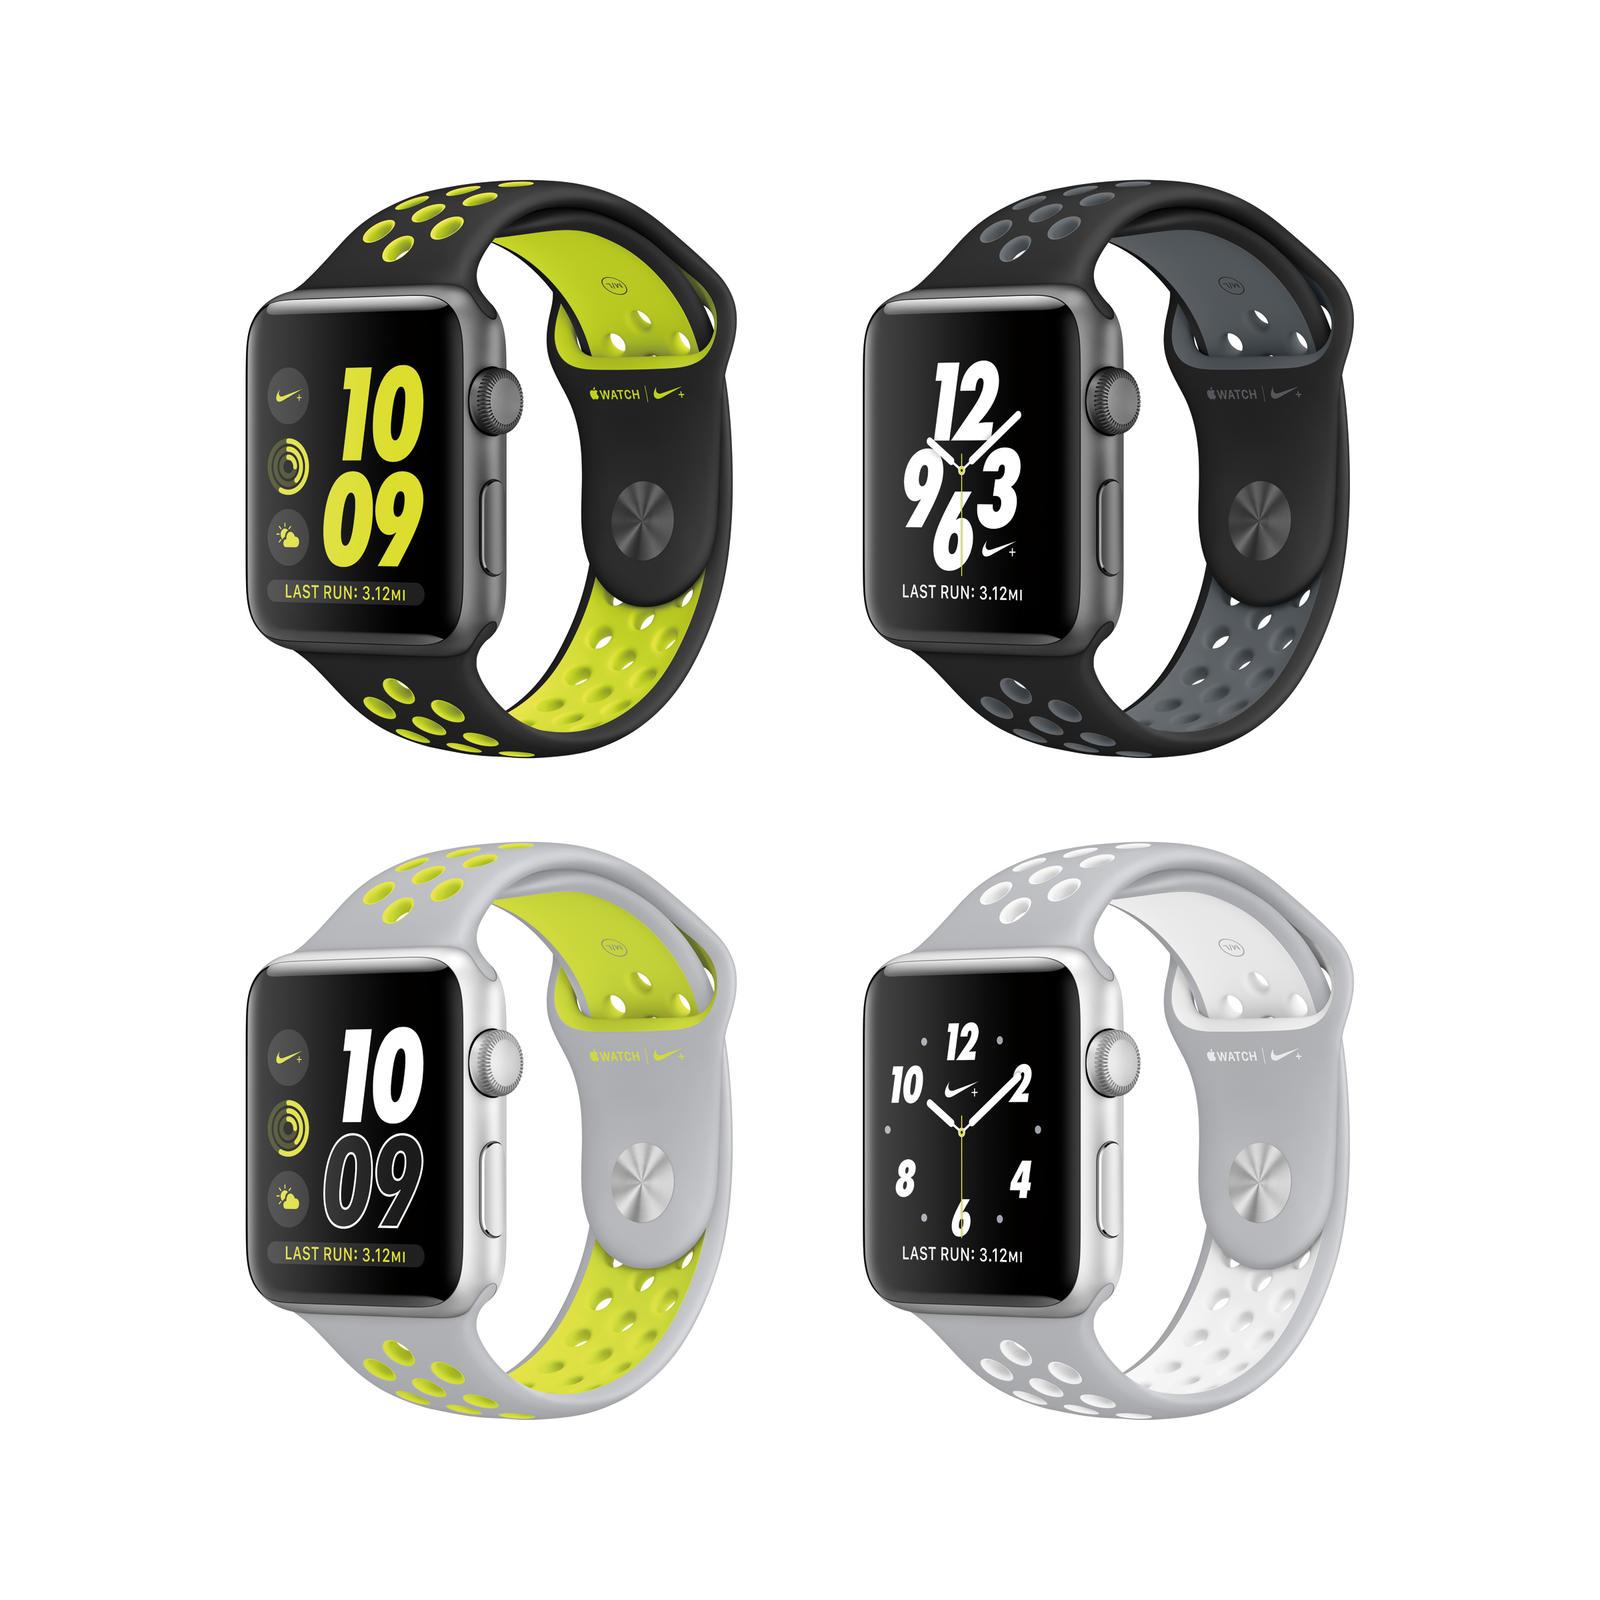 Nike-Plus-Apple-Watch-2016-Clock_native_1600